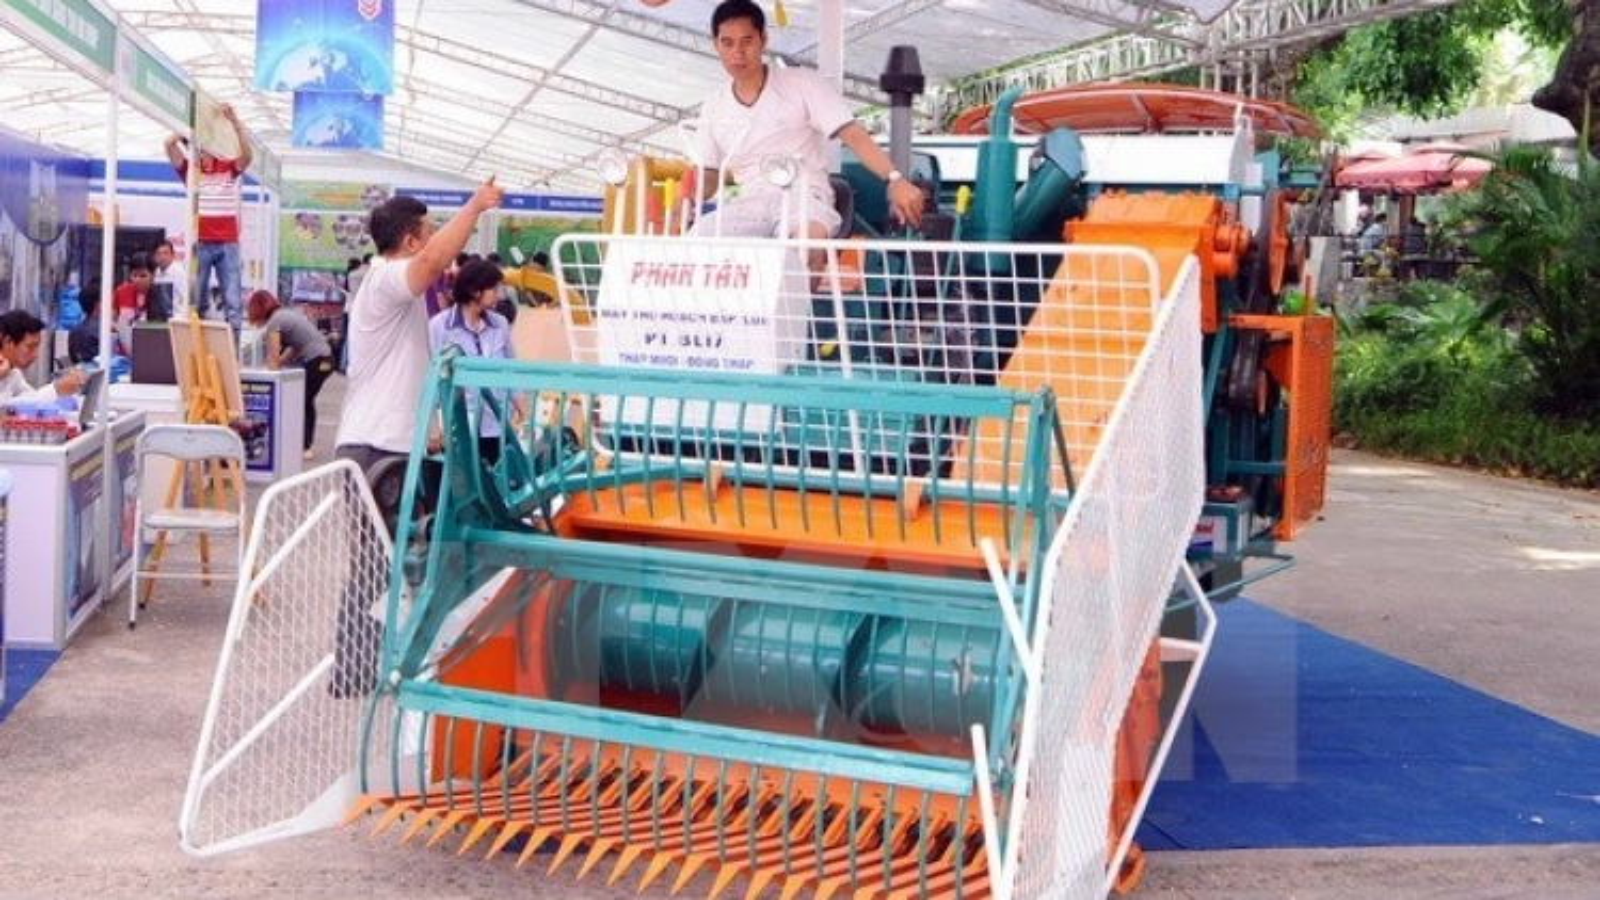 Hanoi technology market introduced